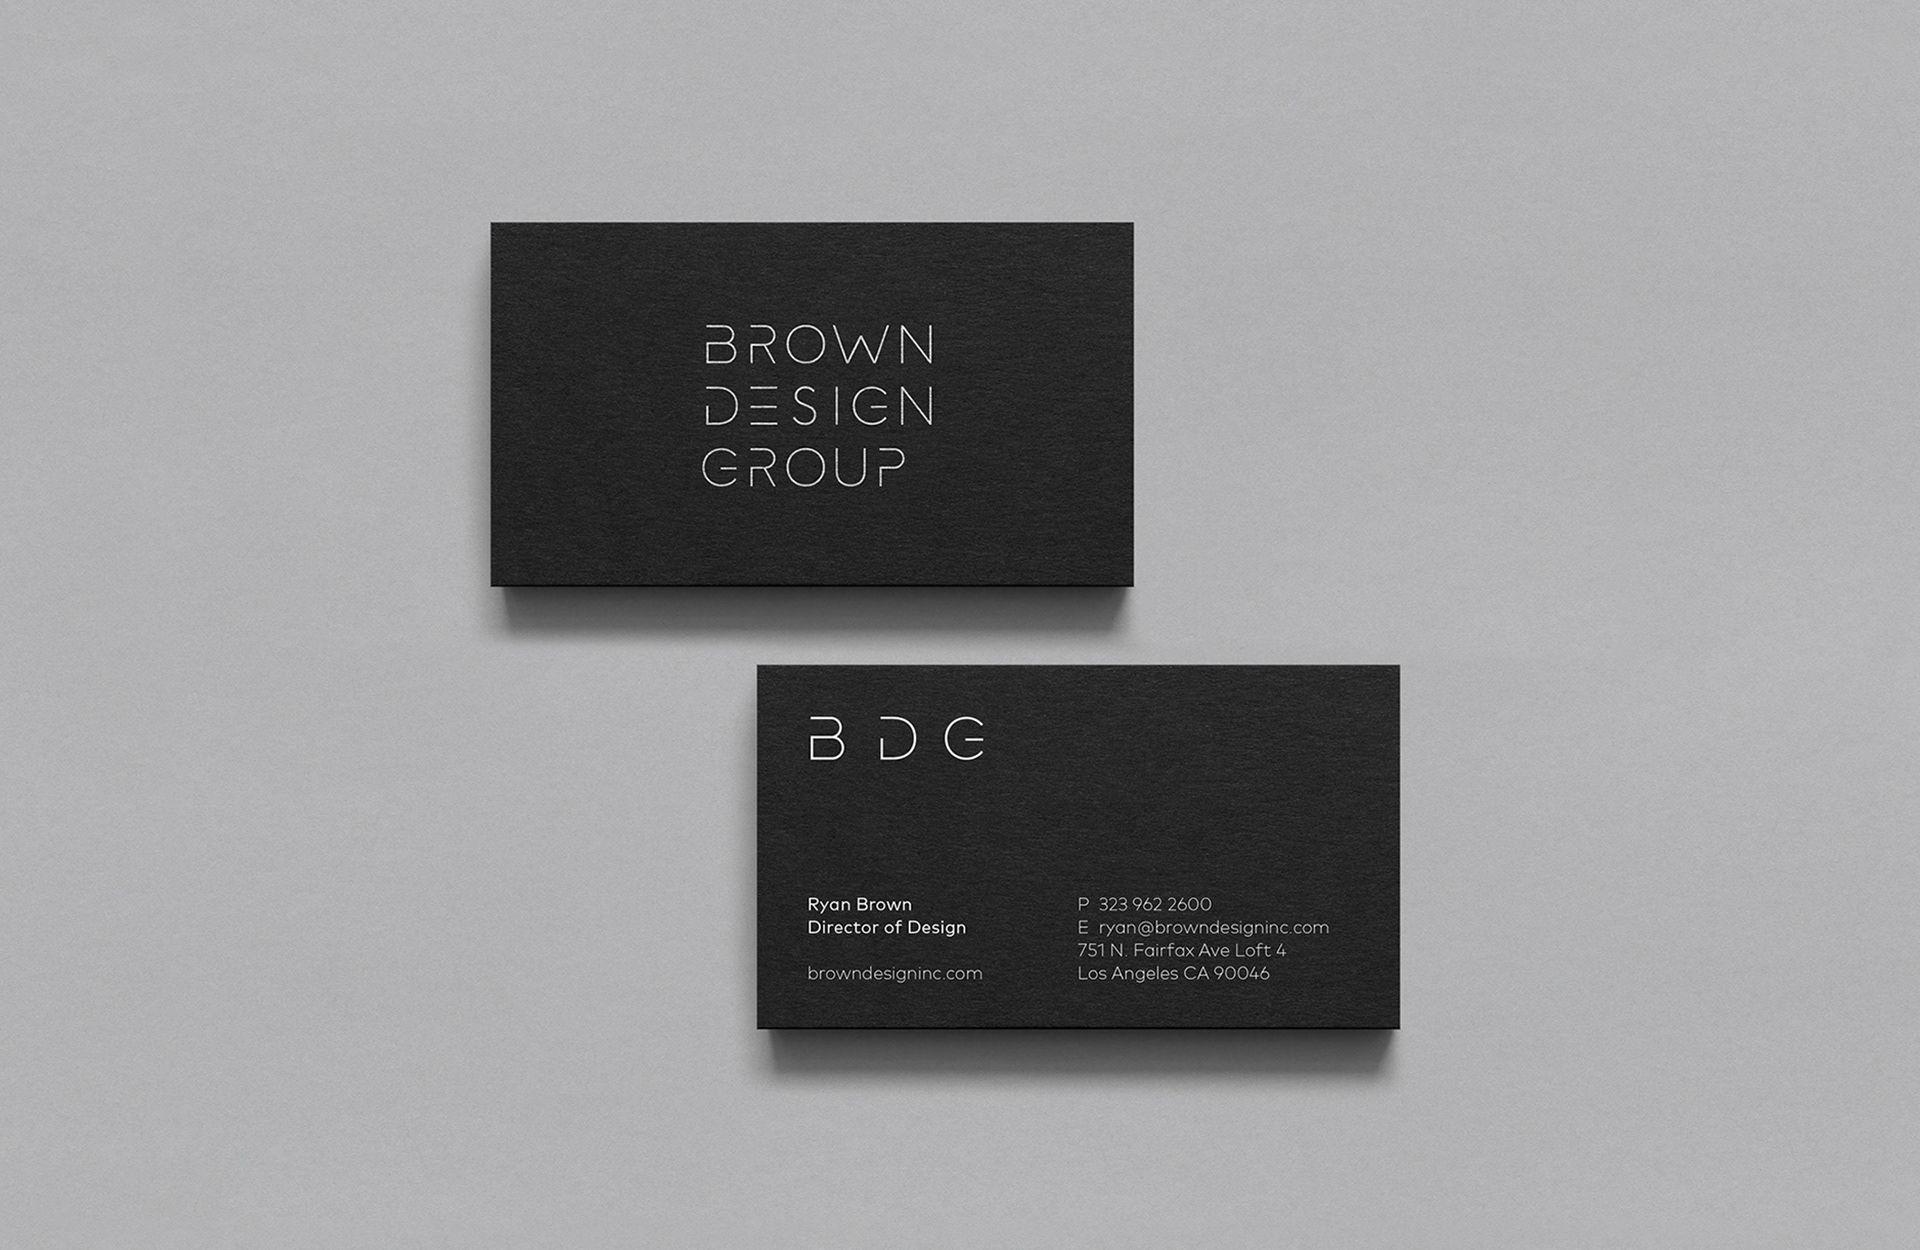 Brown Design Group On Behance Interior Design And Build Design Build Firm Building Design